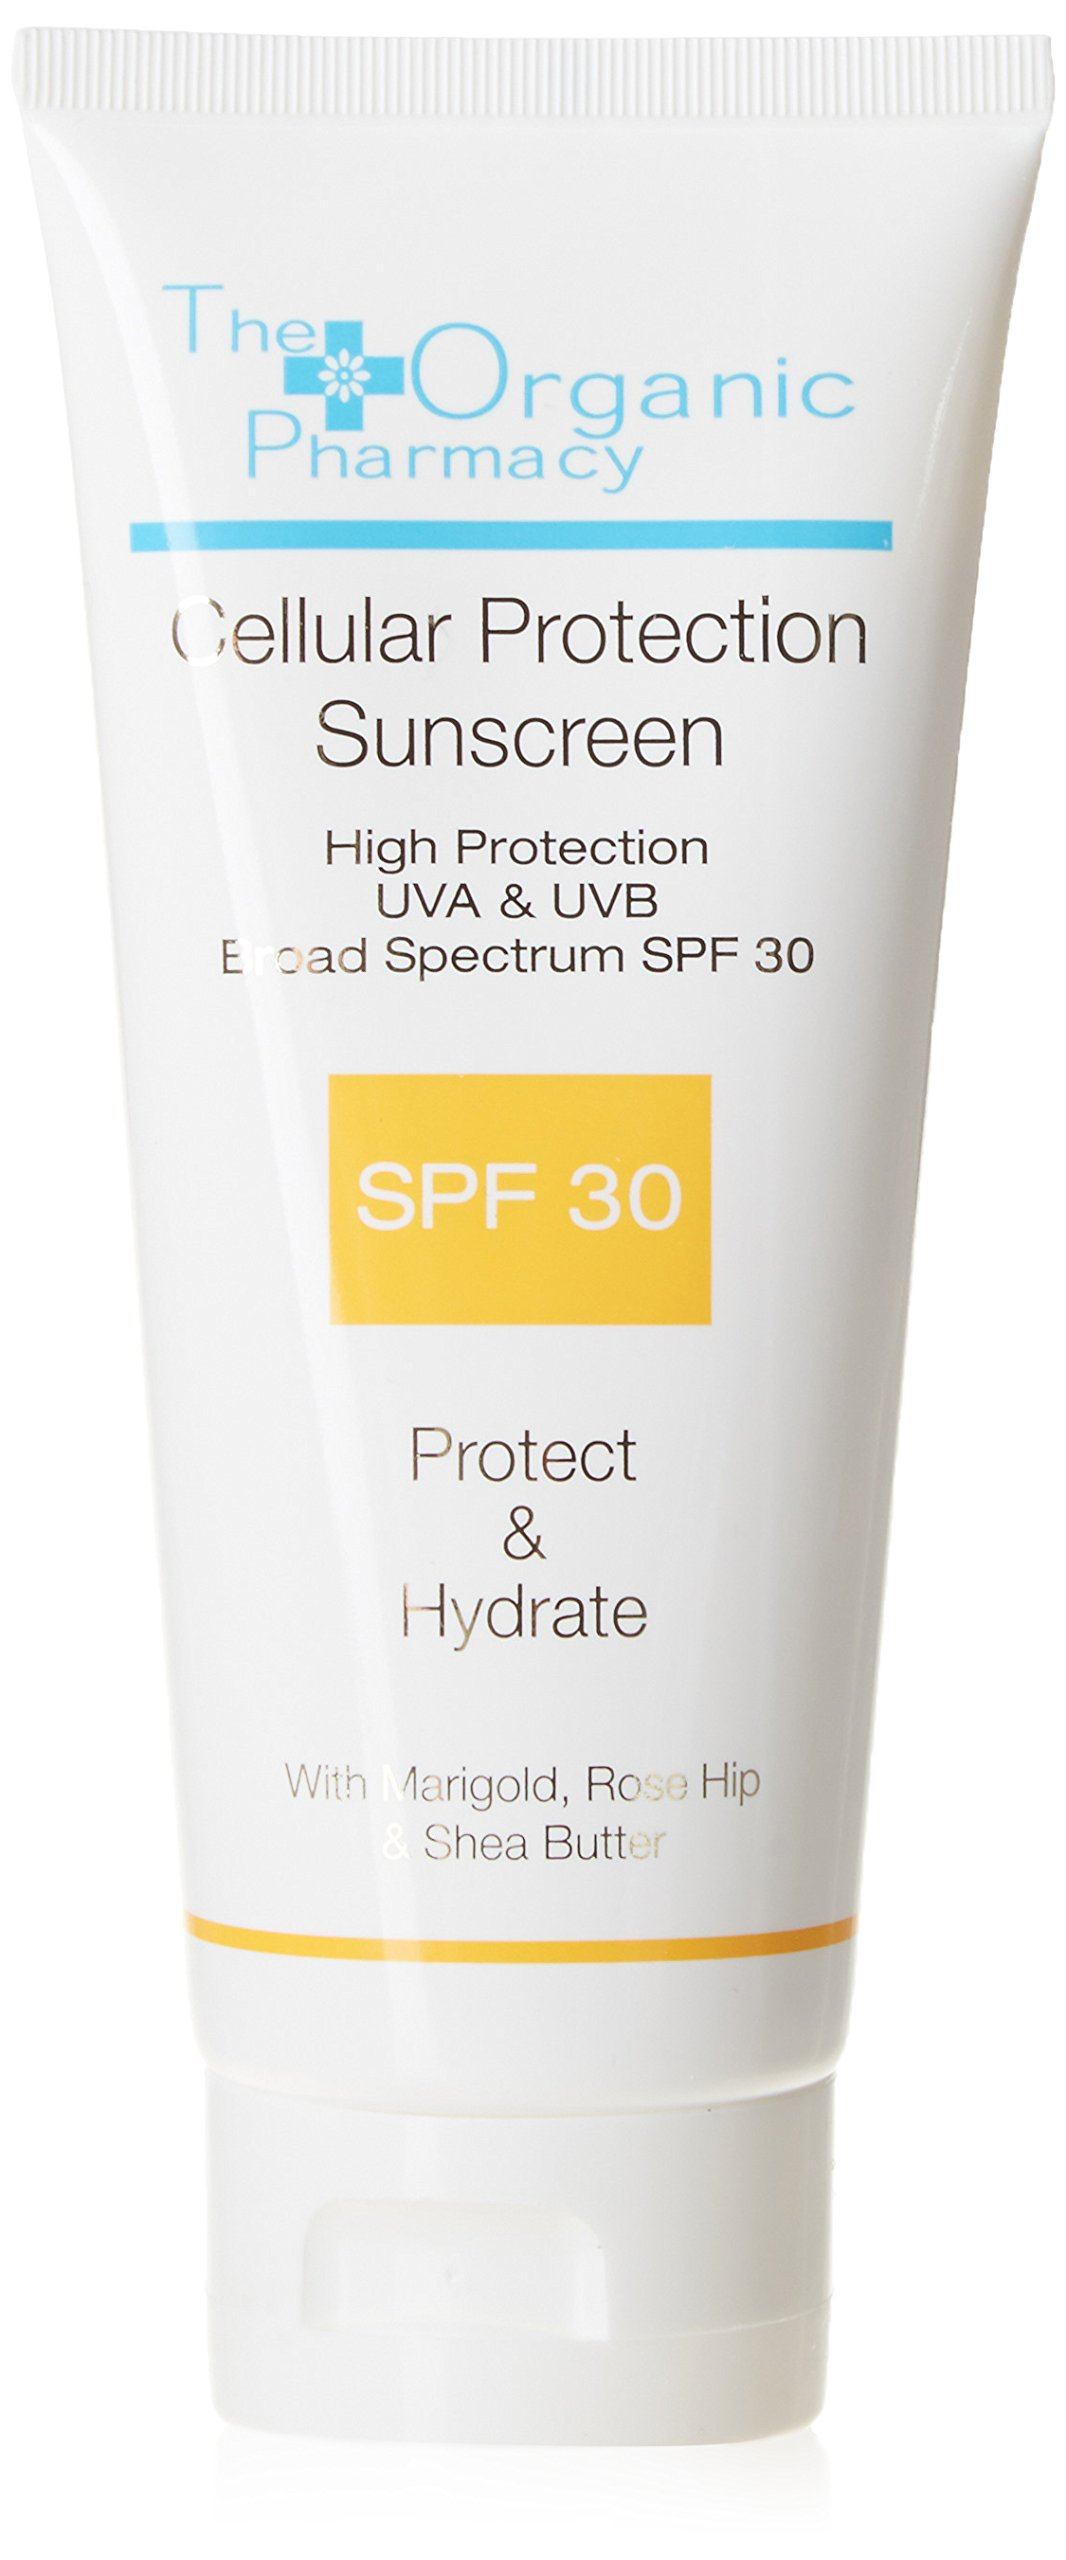 The Organic Pharmacy Cellular Protection Sunscreen, Spf 30, 3.4 Ounce